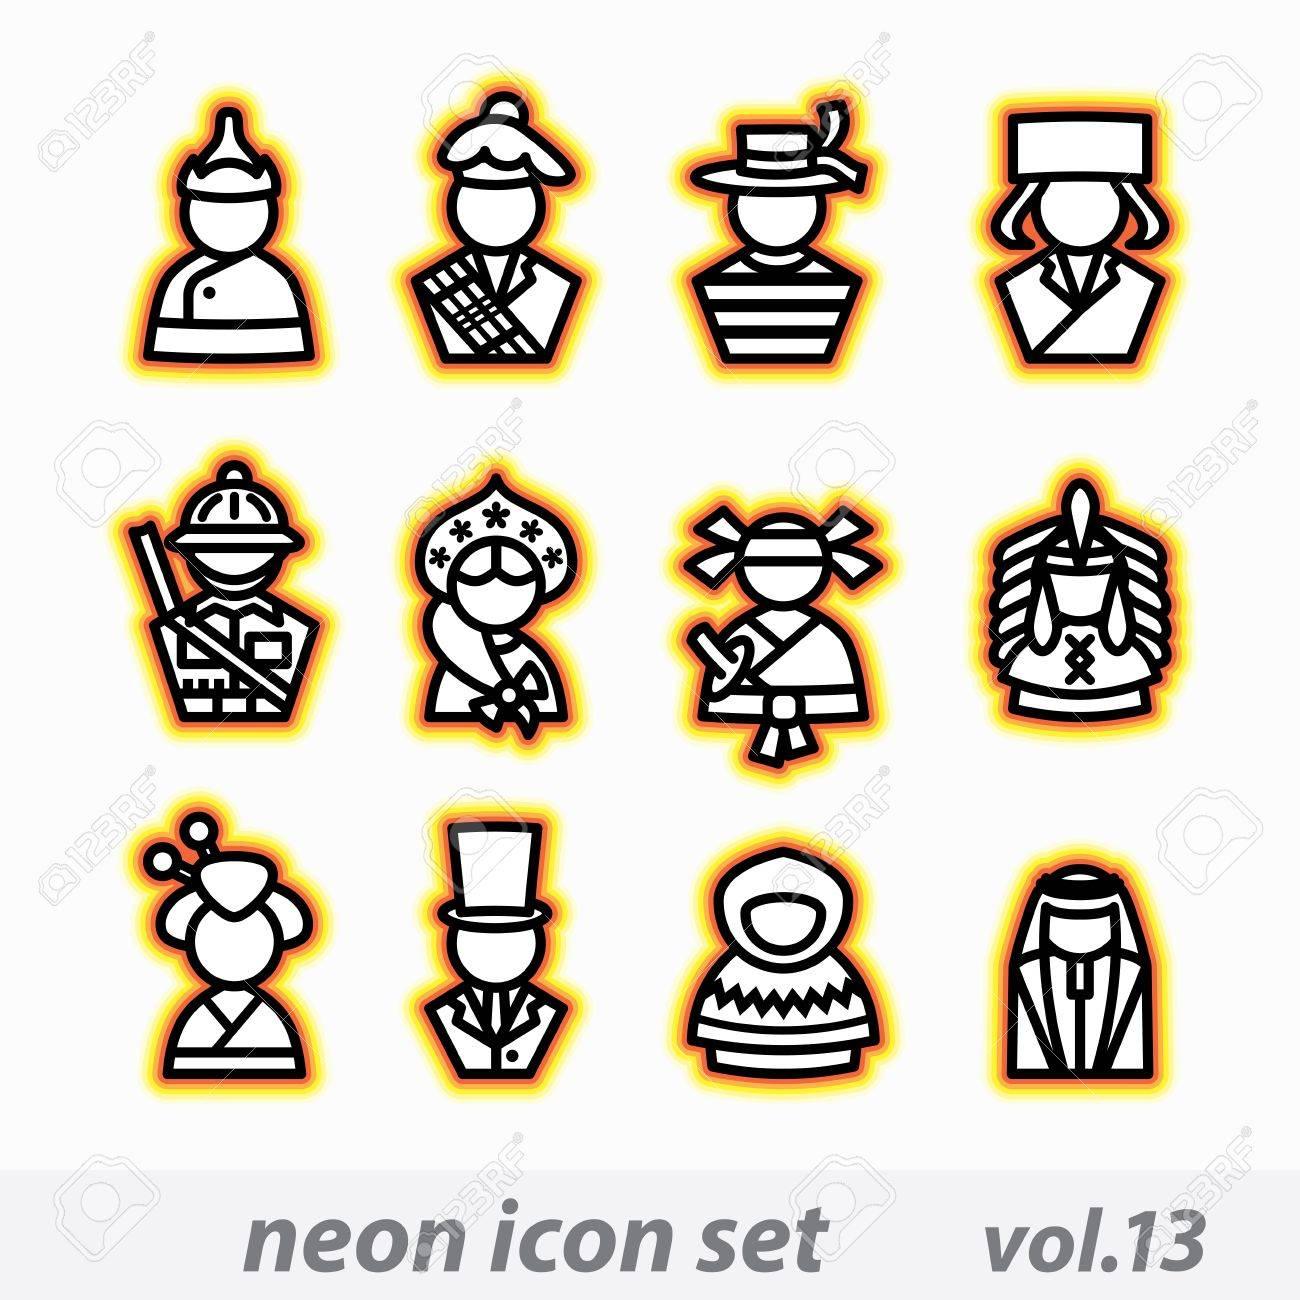 neon icon set vector, CMYK Stock Vector - 16268852